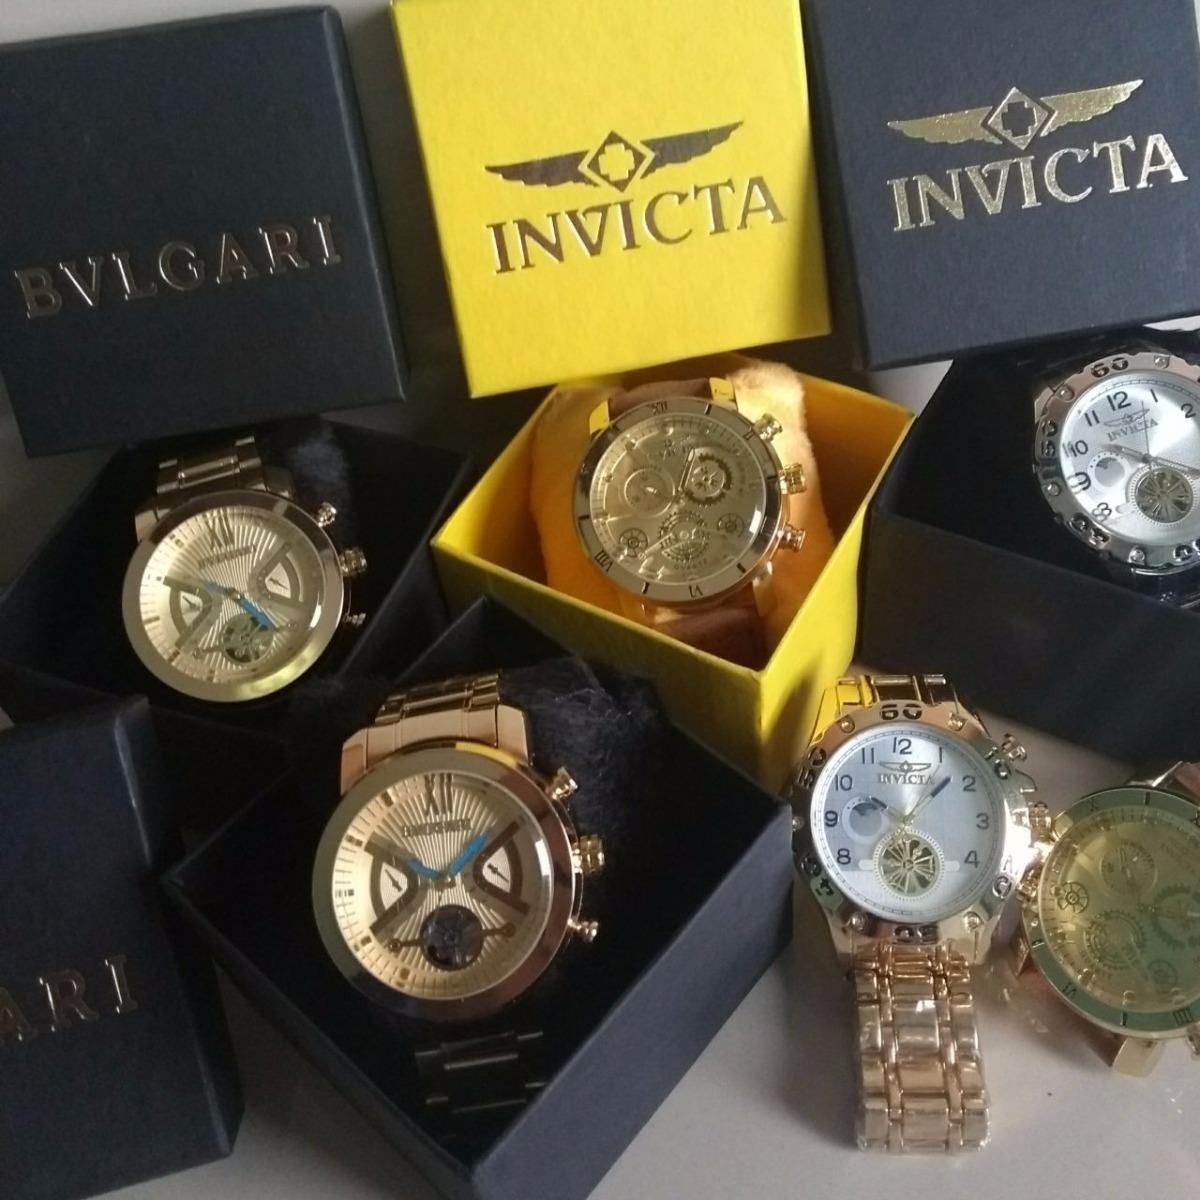 0bf59754c81 exclusivo kit com 5 relógios masculino luxo + caixa atacado. Carregando  zoom.